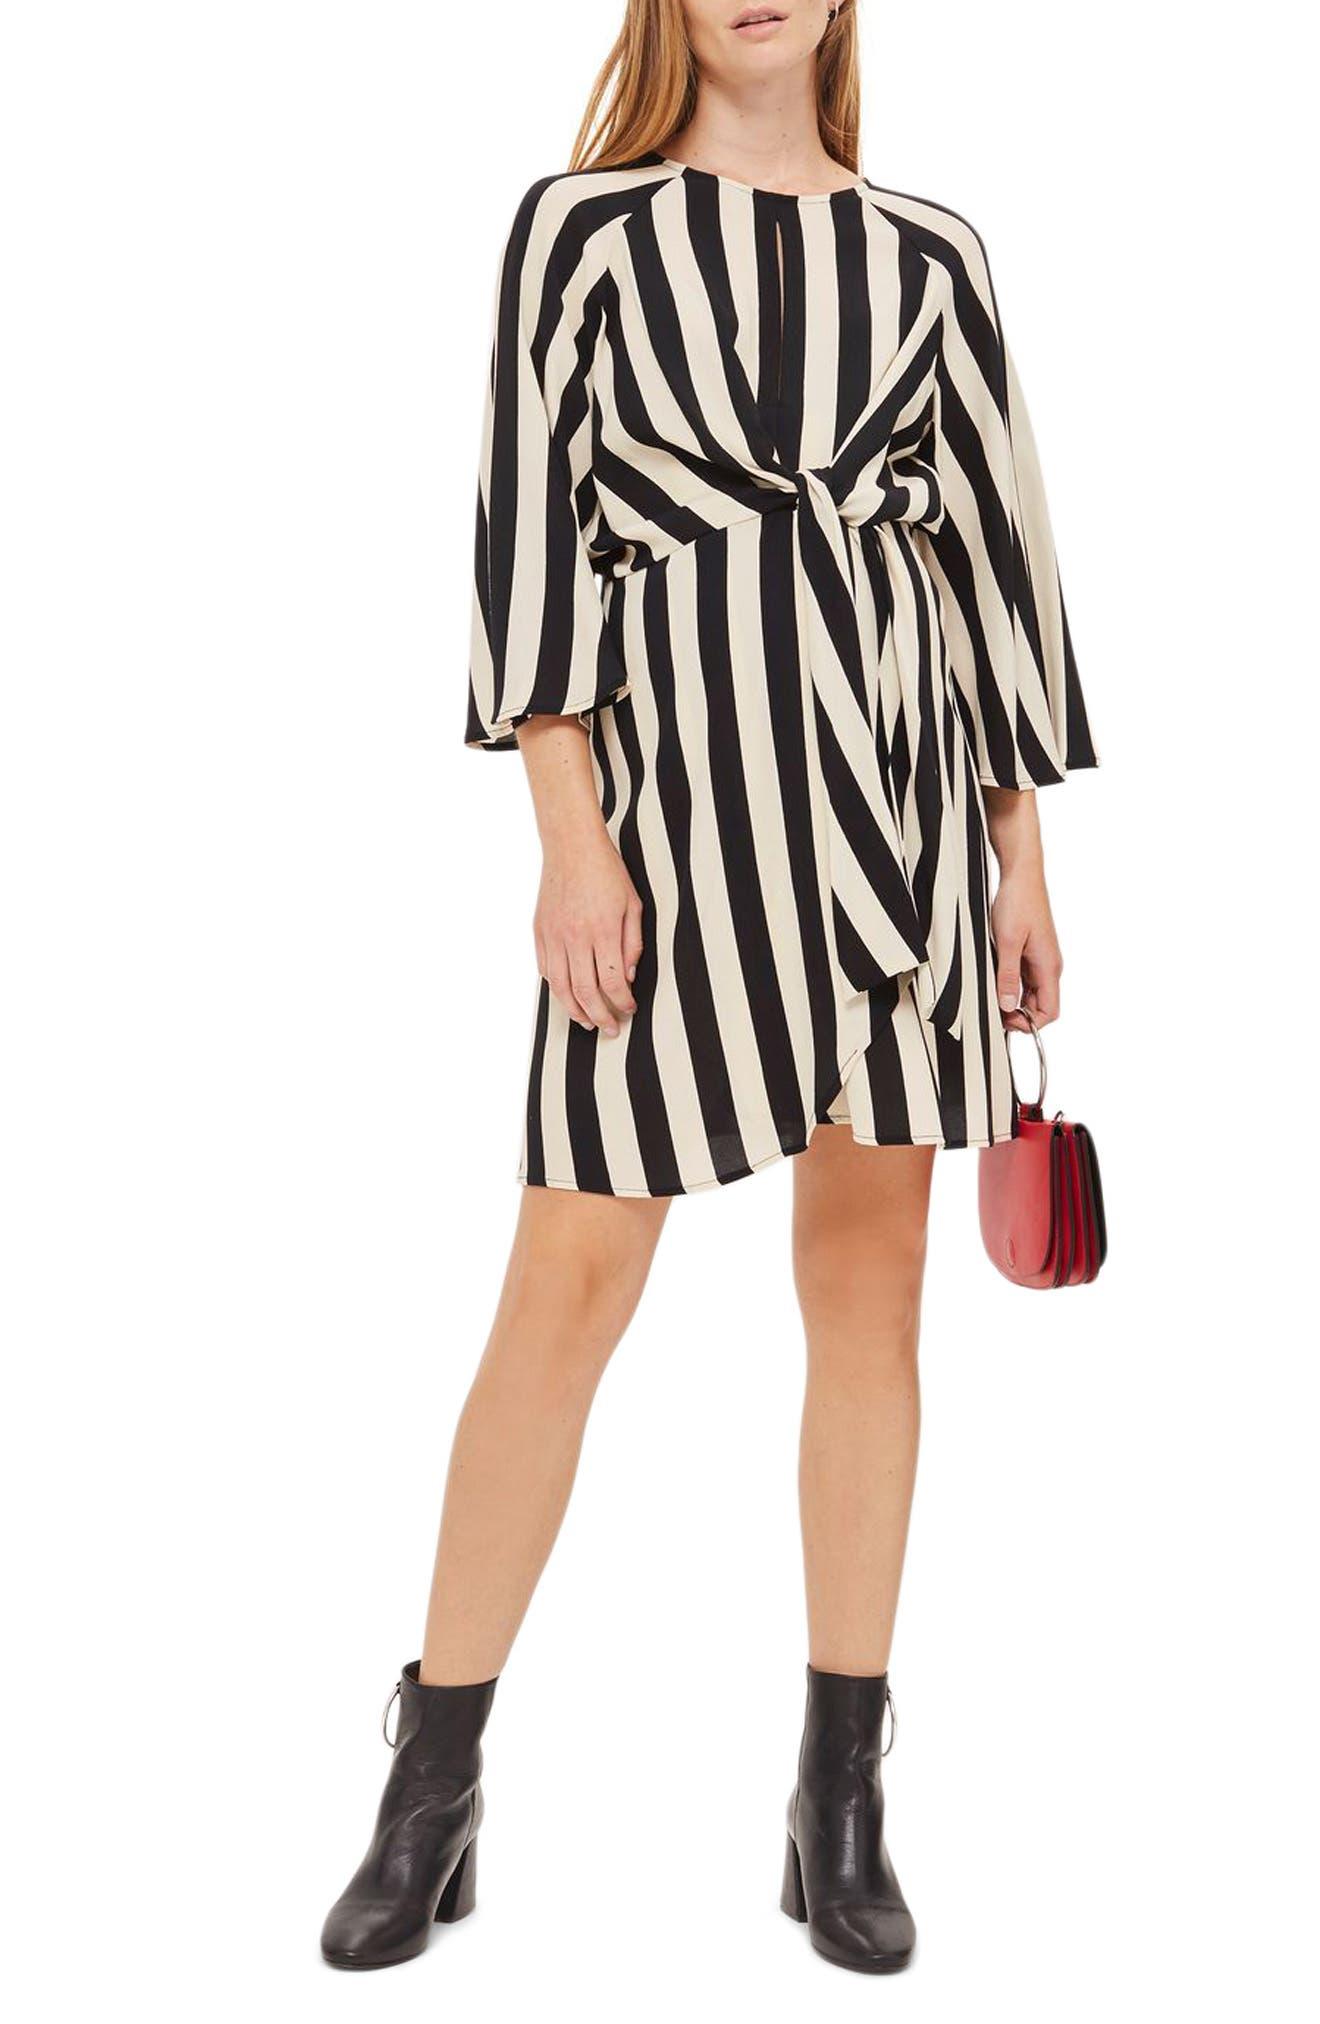 Humbug Stripe Knot Maternity Dress,                         Main,                         color, Ivory Multi